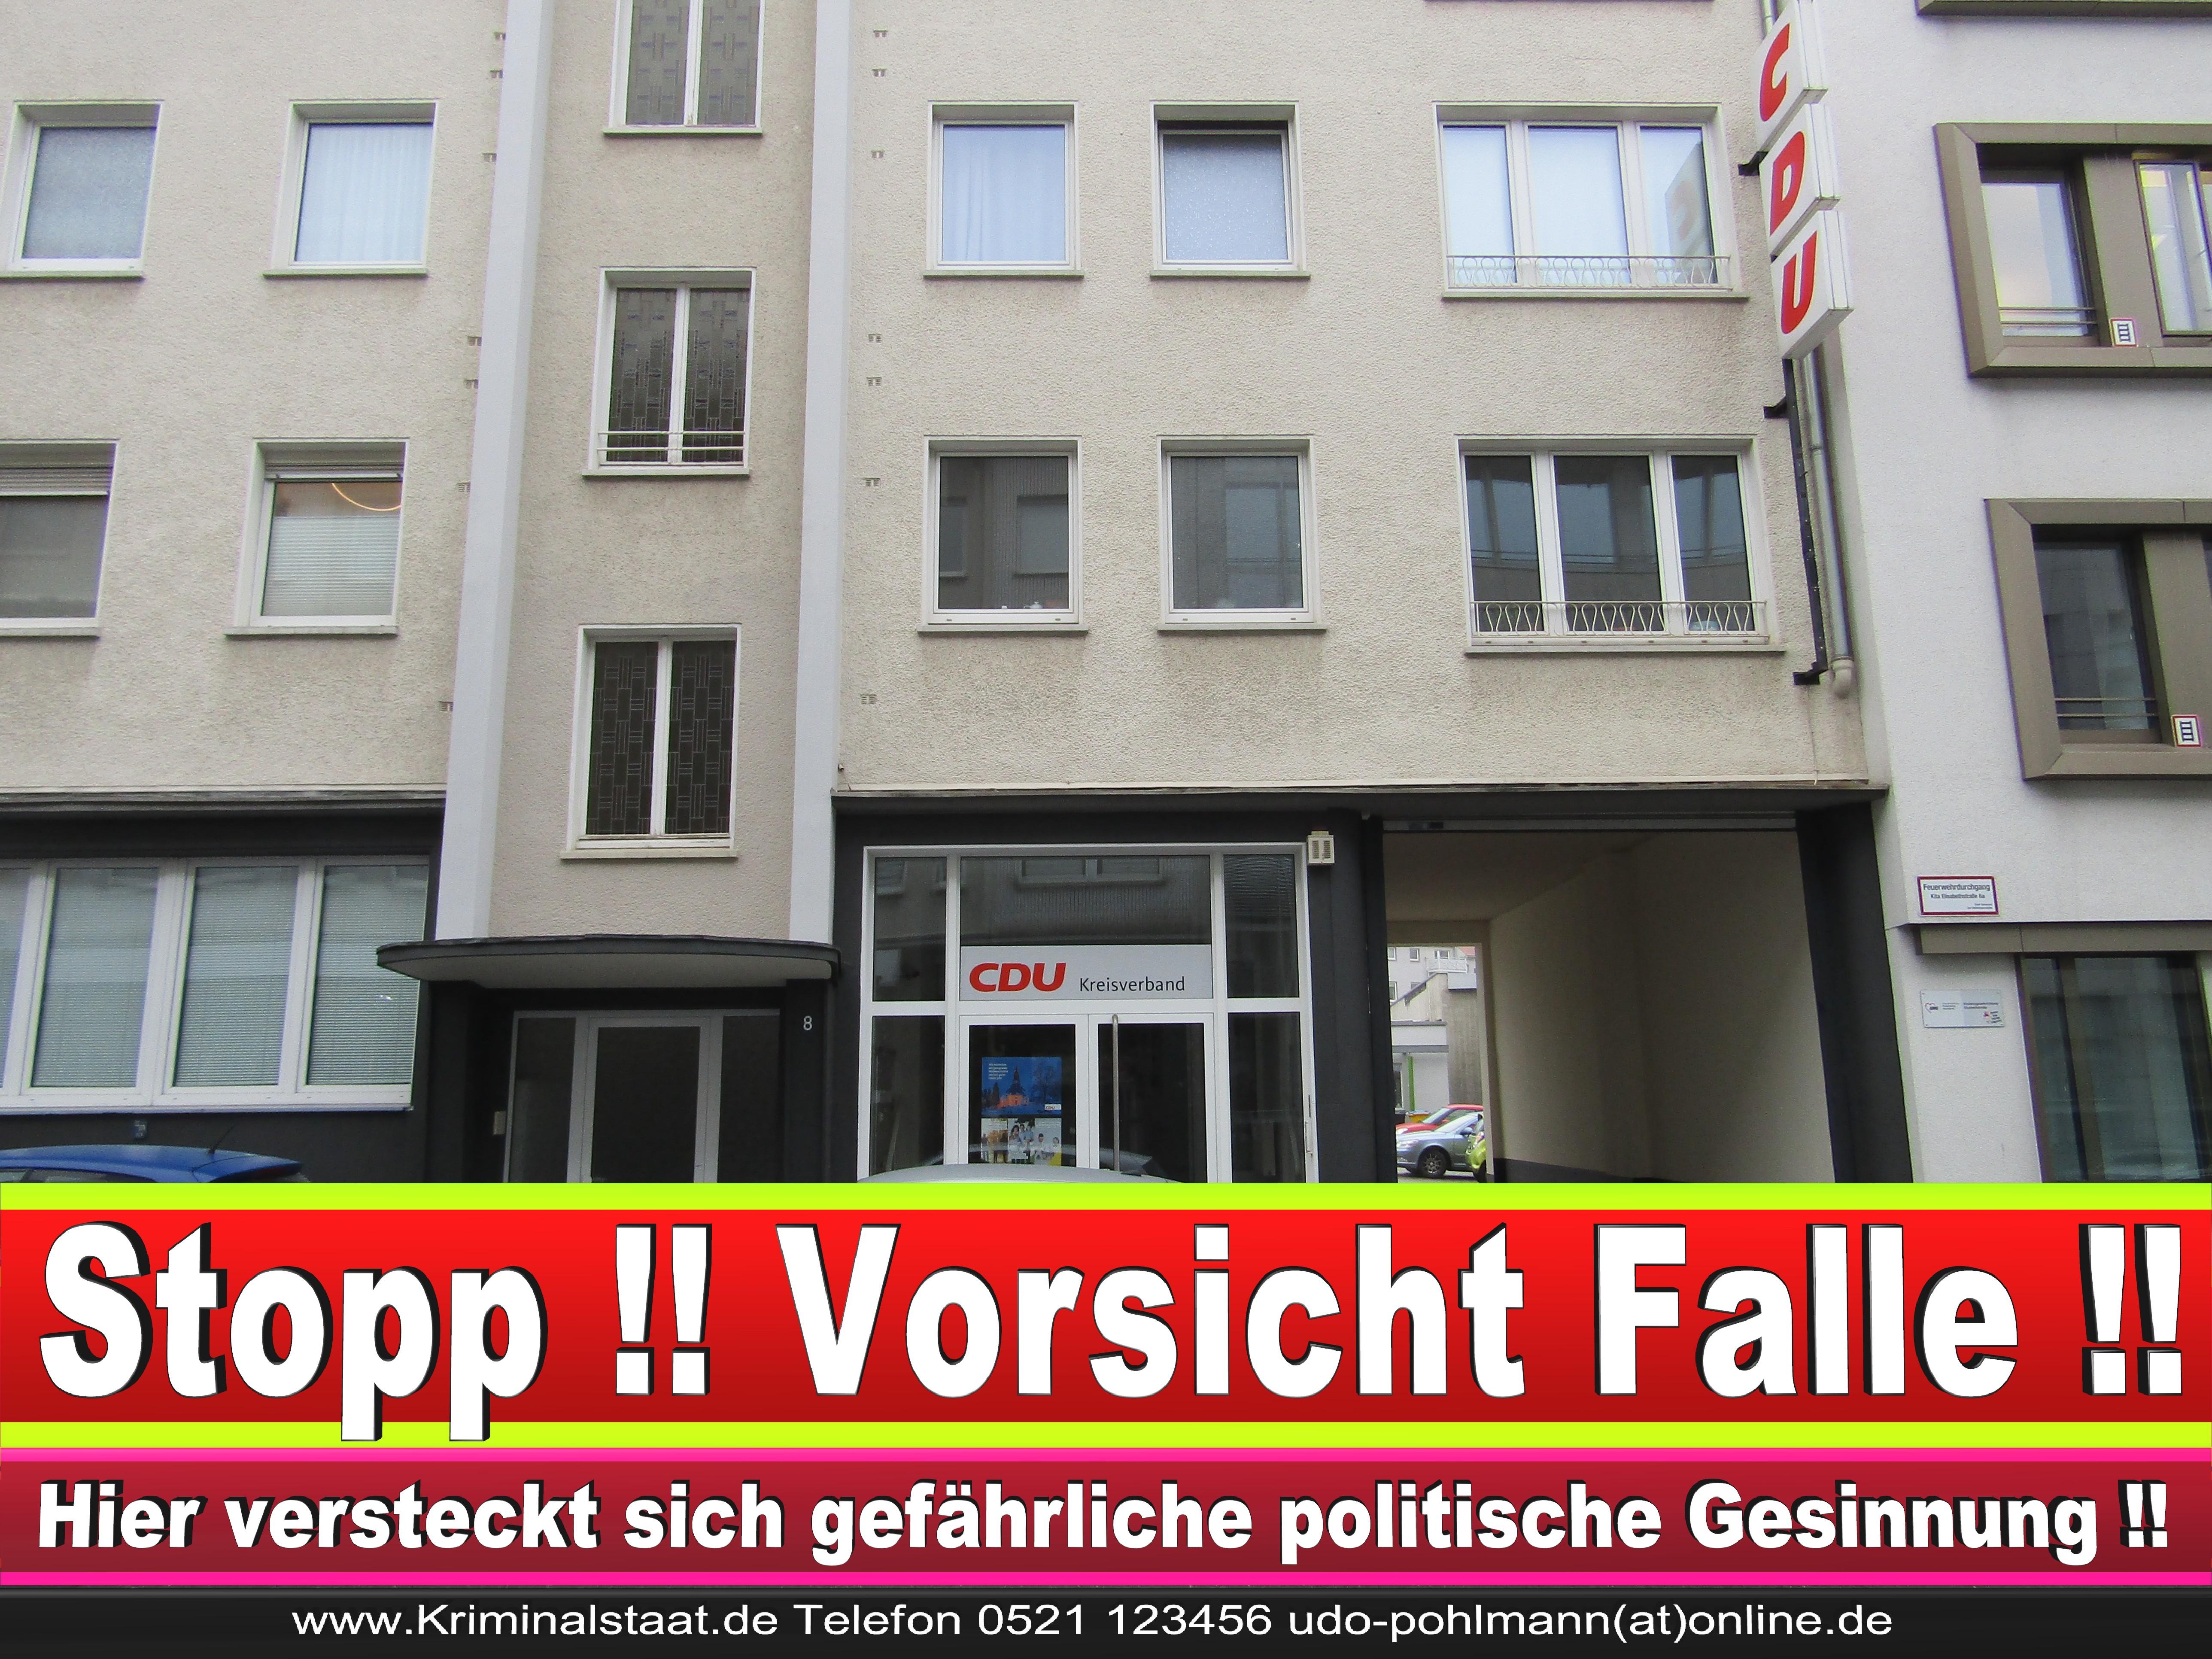 CDU DORTMUND KREISVERBAND BüRGERBüRO CDU FRAKTION ORTSVERBAND CDU NRW GESCHäFTSSTELLE ADRESSE RATSMITGLIEDER CDU (20) 1